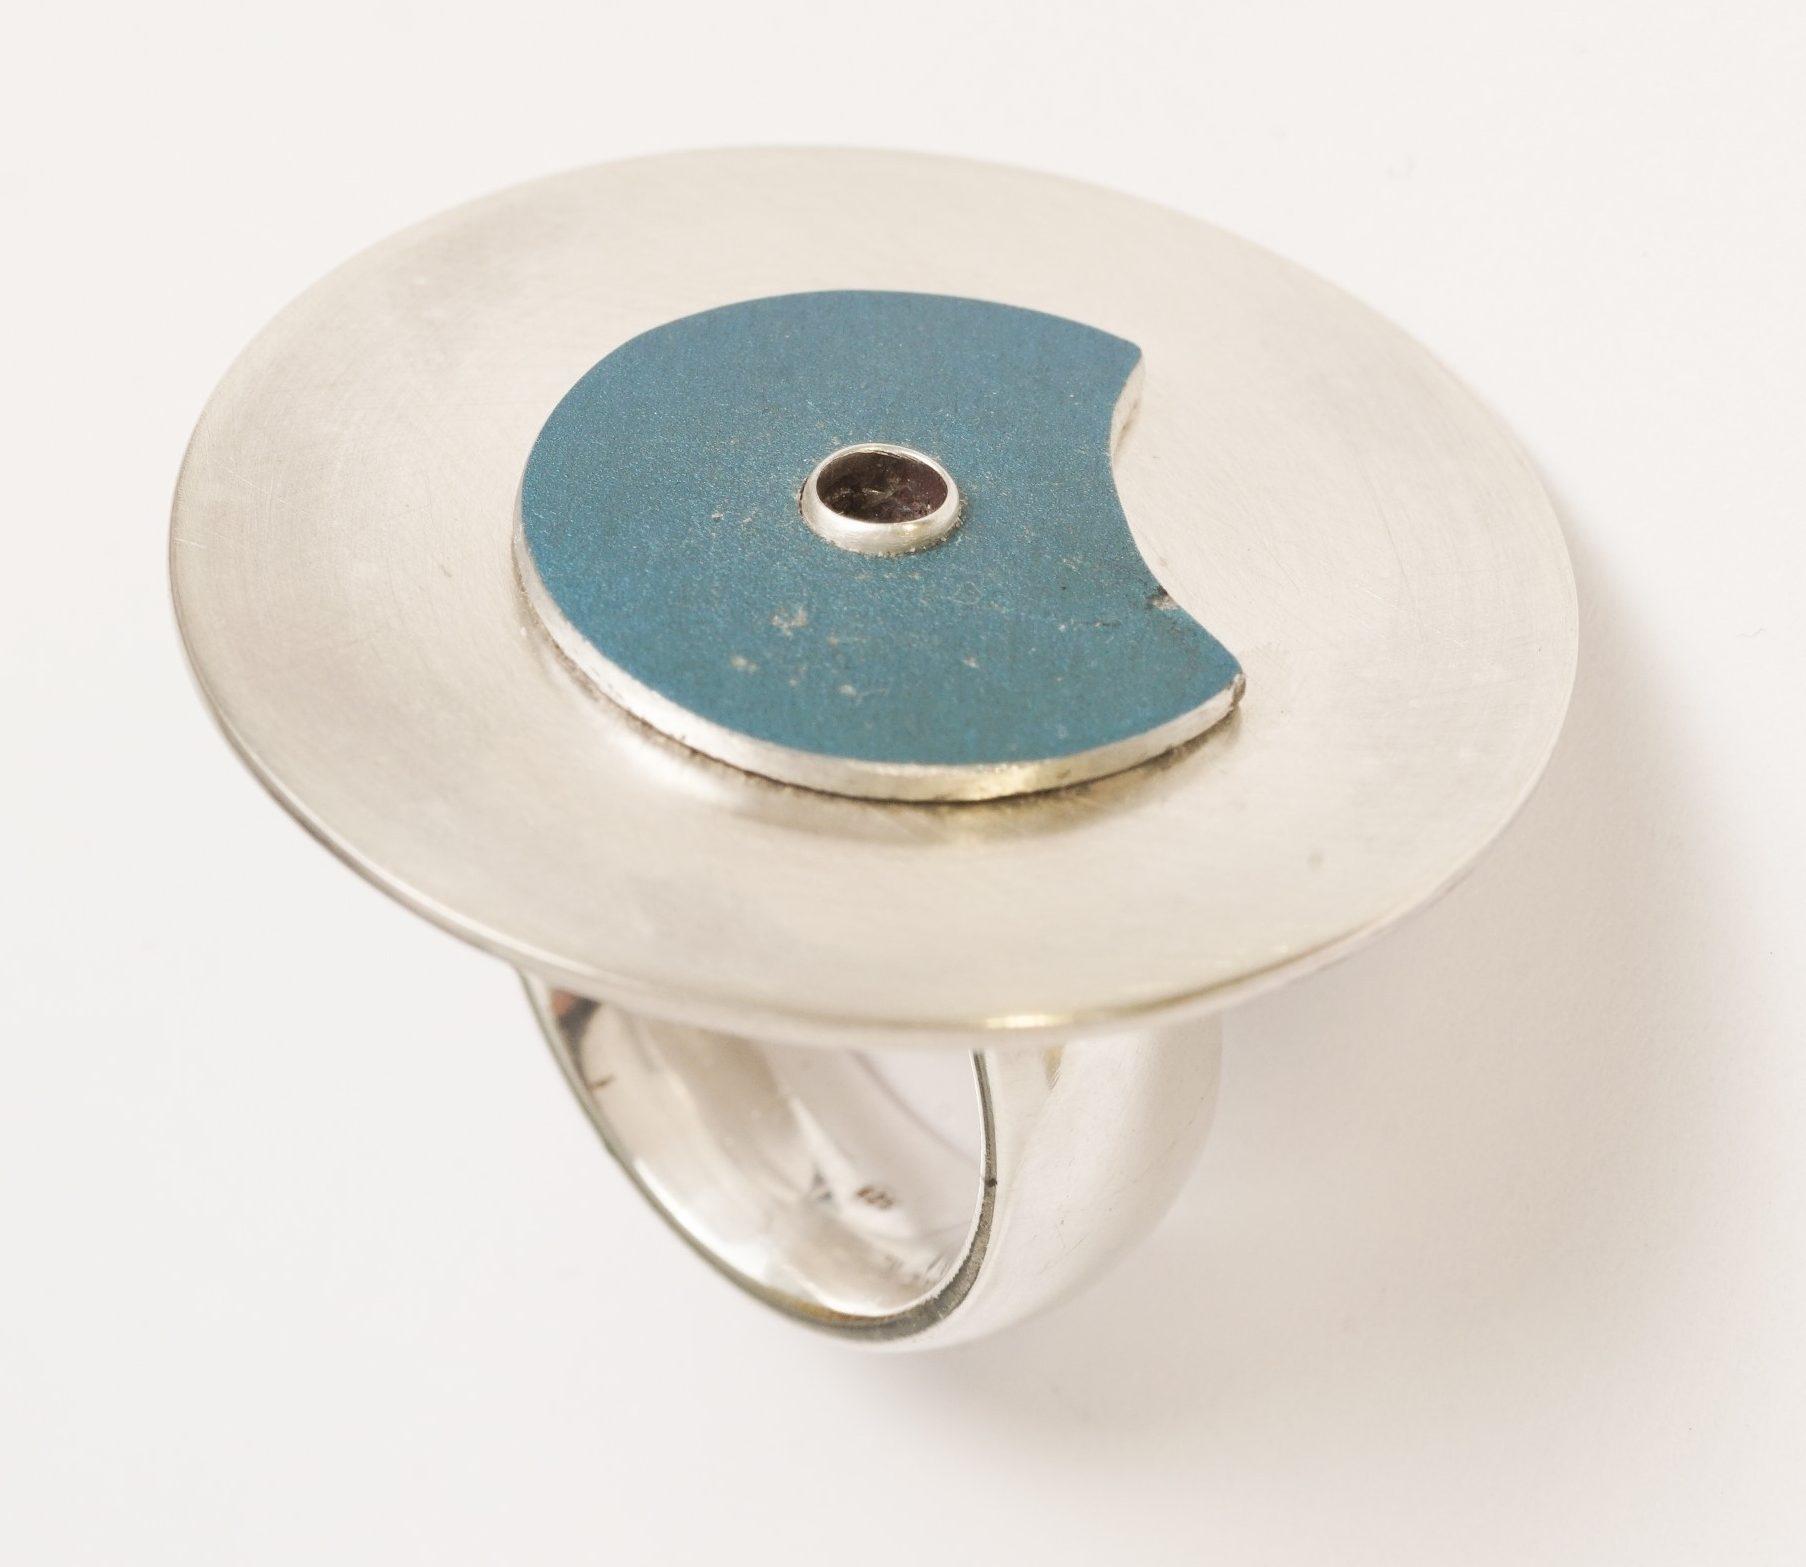 Karel Betman, ring, 2019, zilver, geanodiseerd aluminium